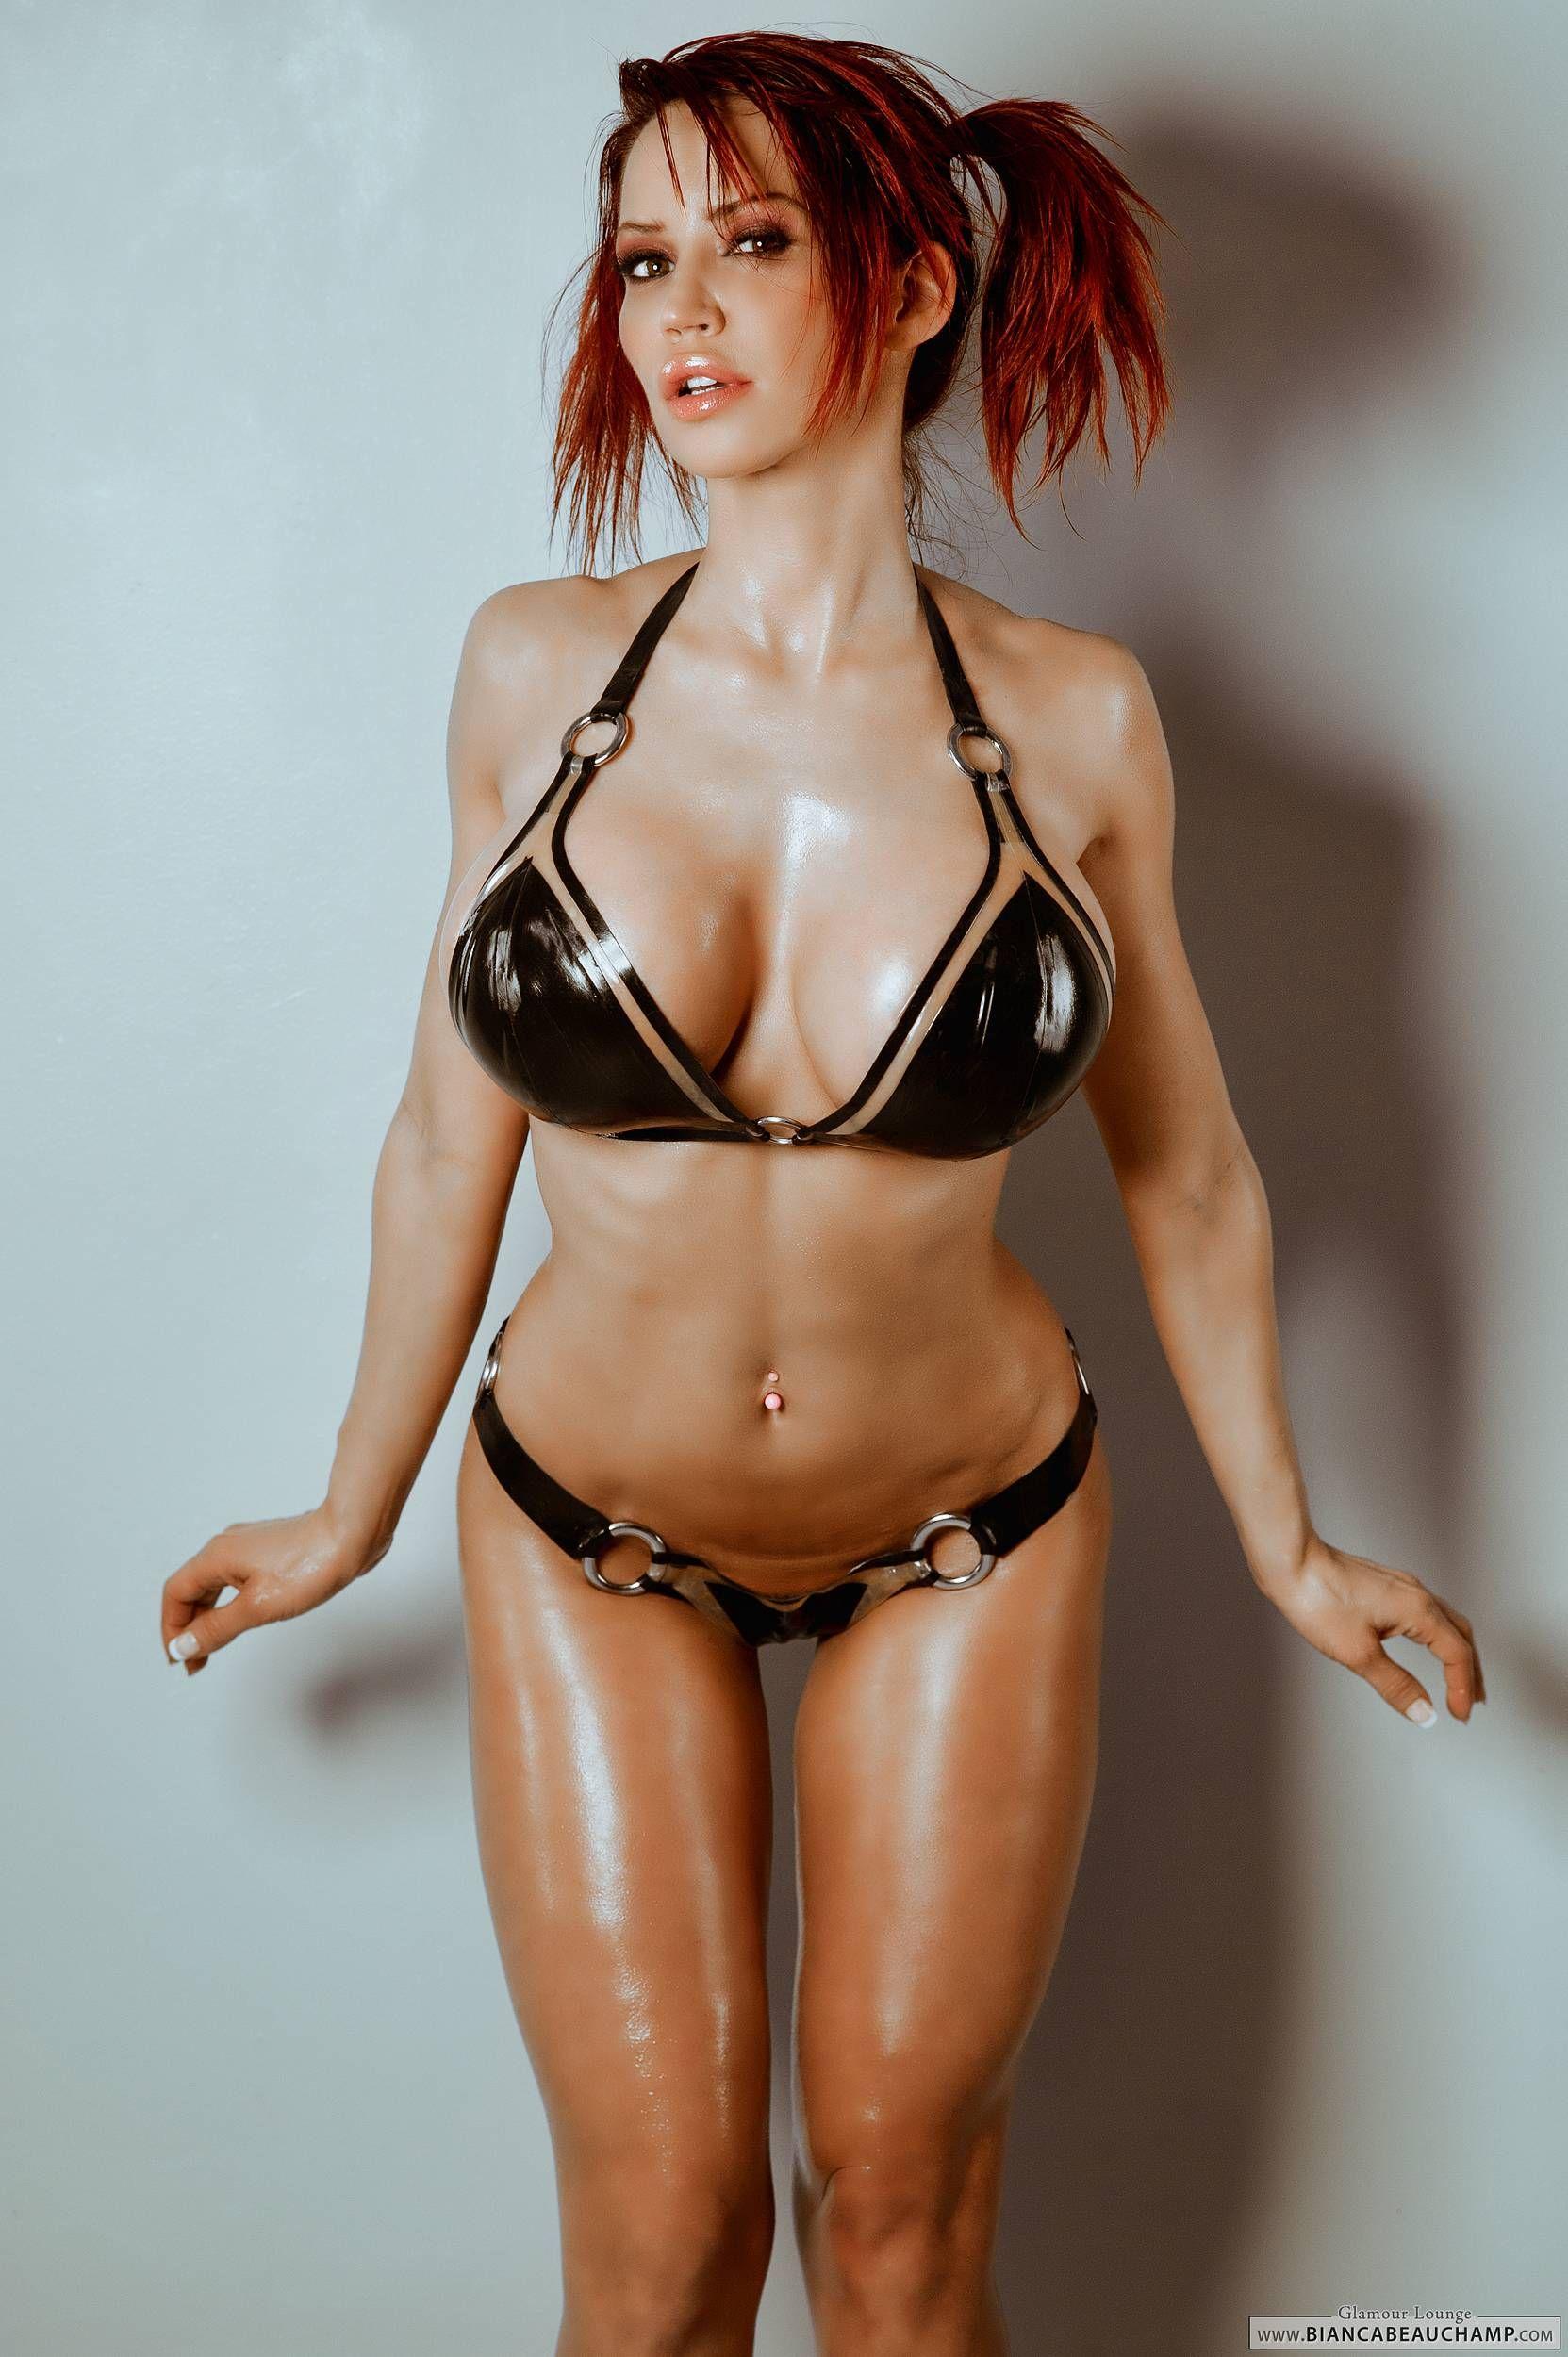 Very tiny jr girl nude